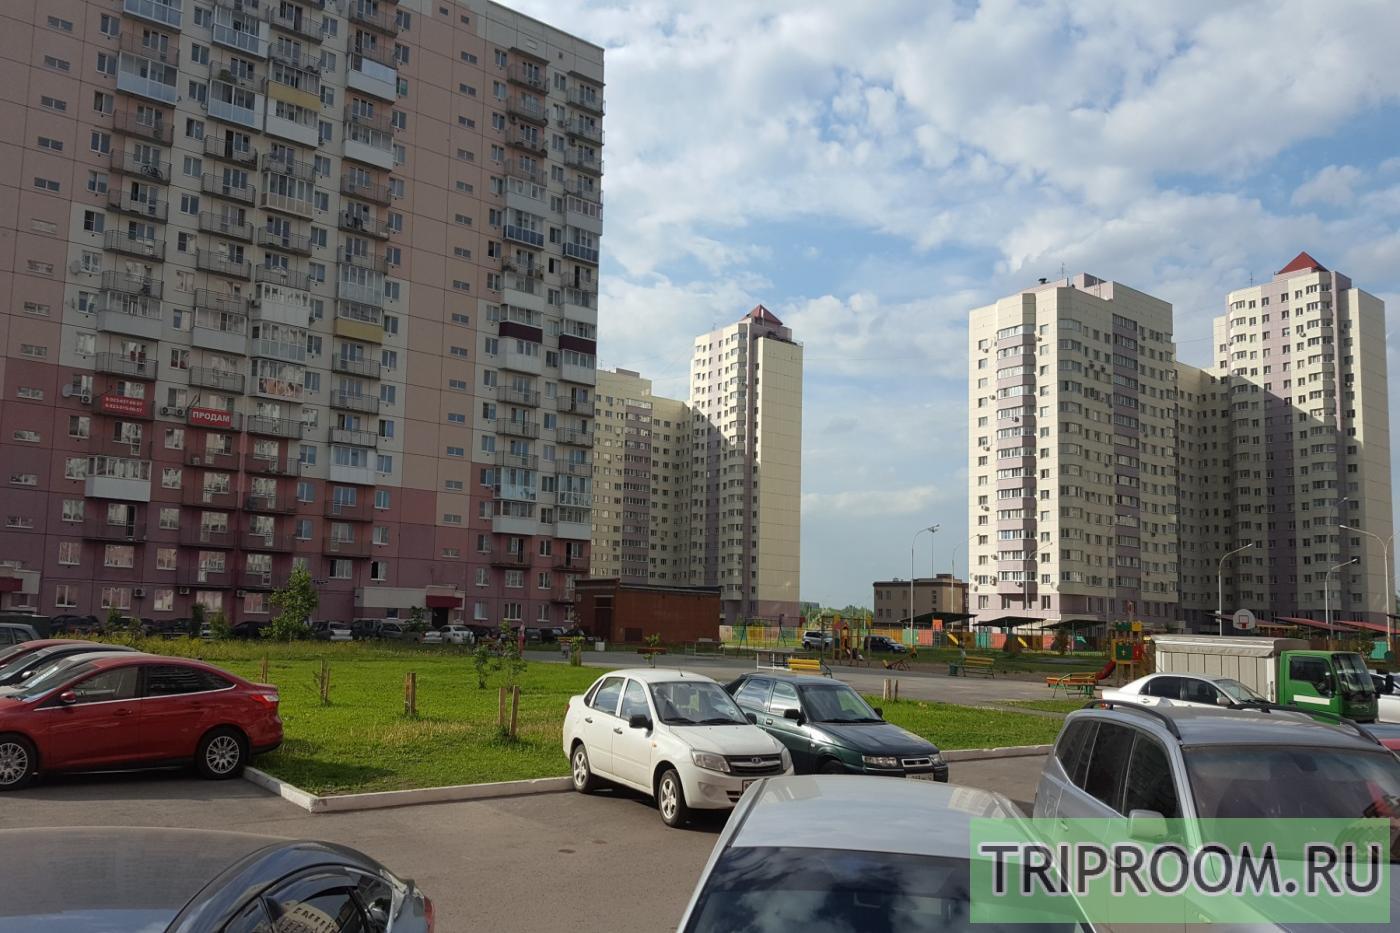 1-комнатная квартира посуточно (вариант № 30838), ул. Ермакова улица, фото № 5